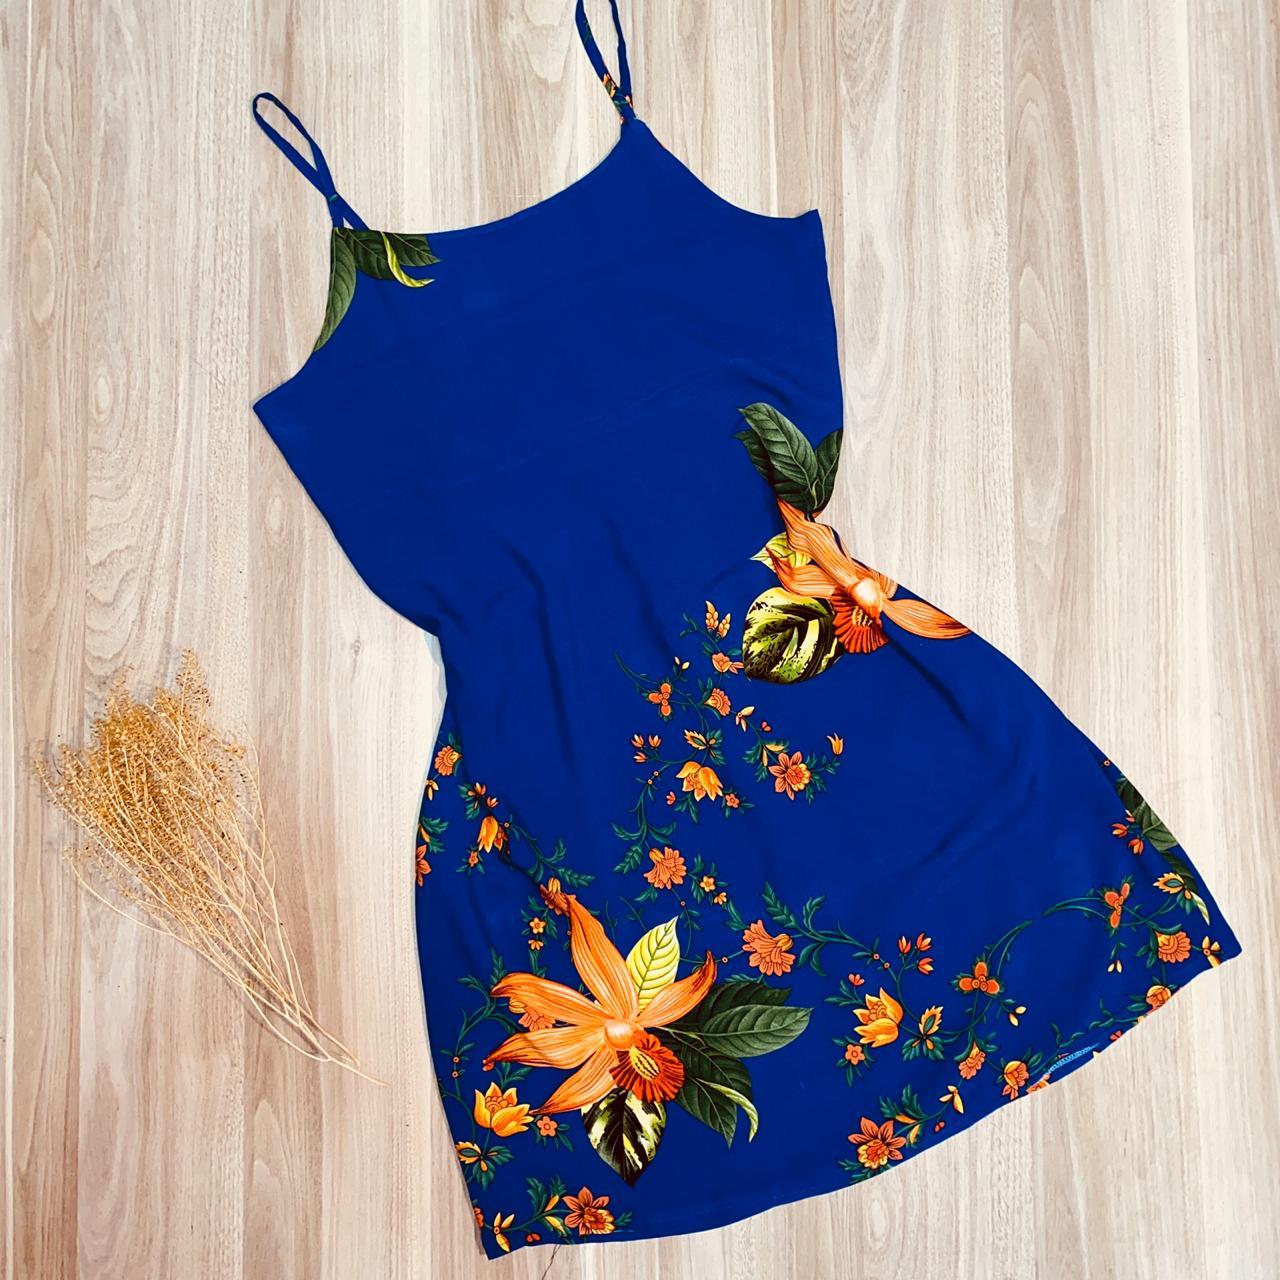 Vestido Alcinha Curto Rebeca Jardim Azul